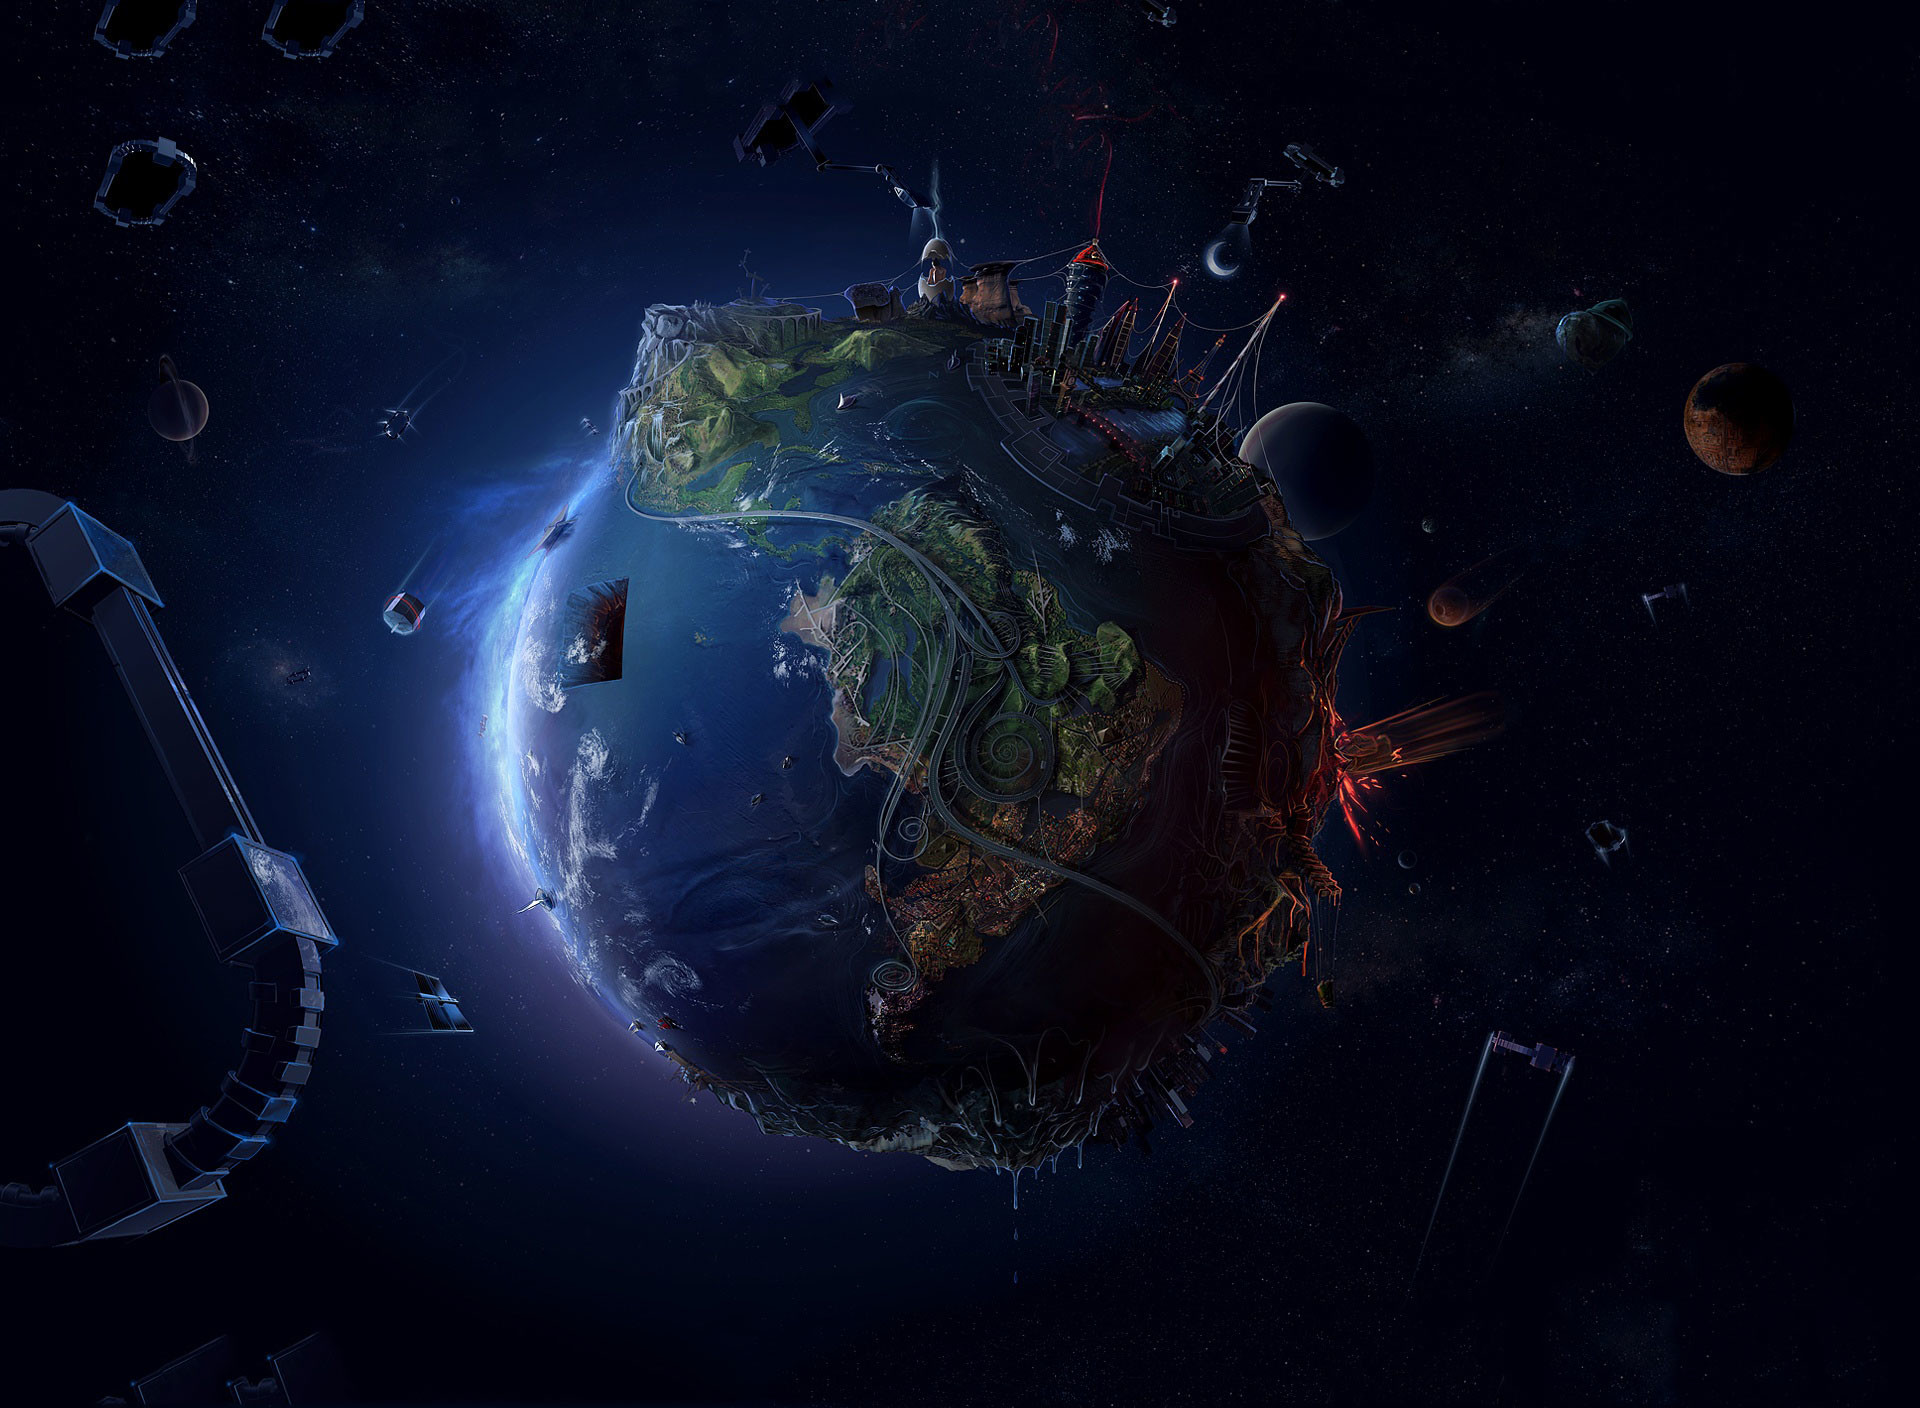 … Future Earth tablet wallpaper …